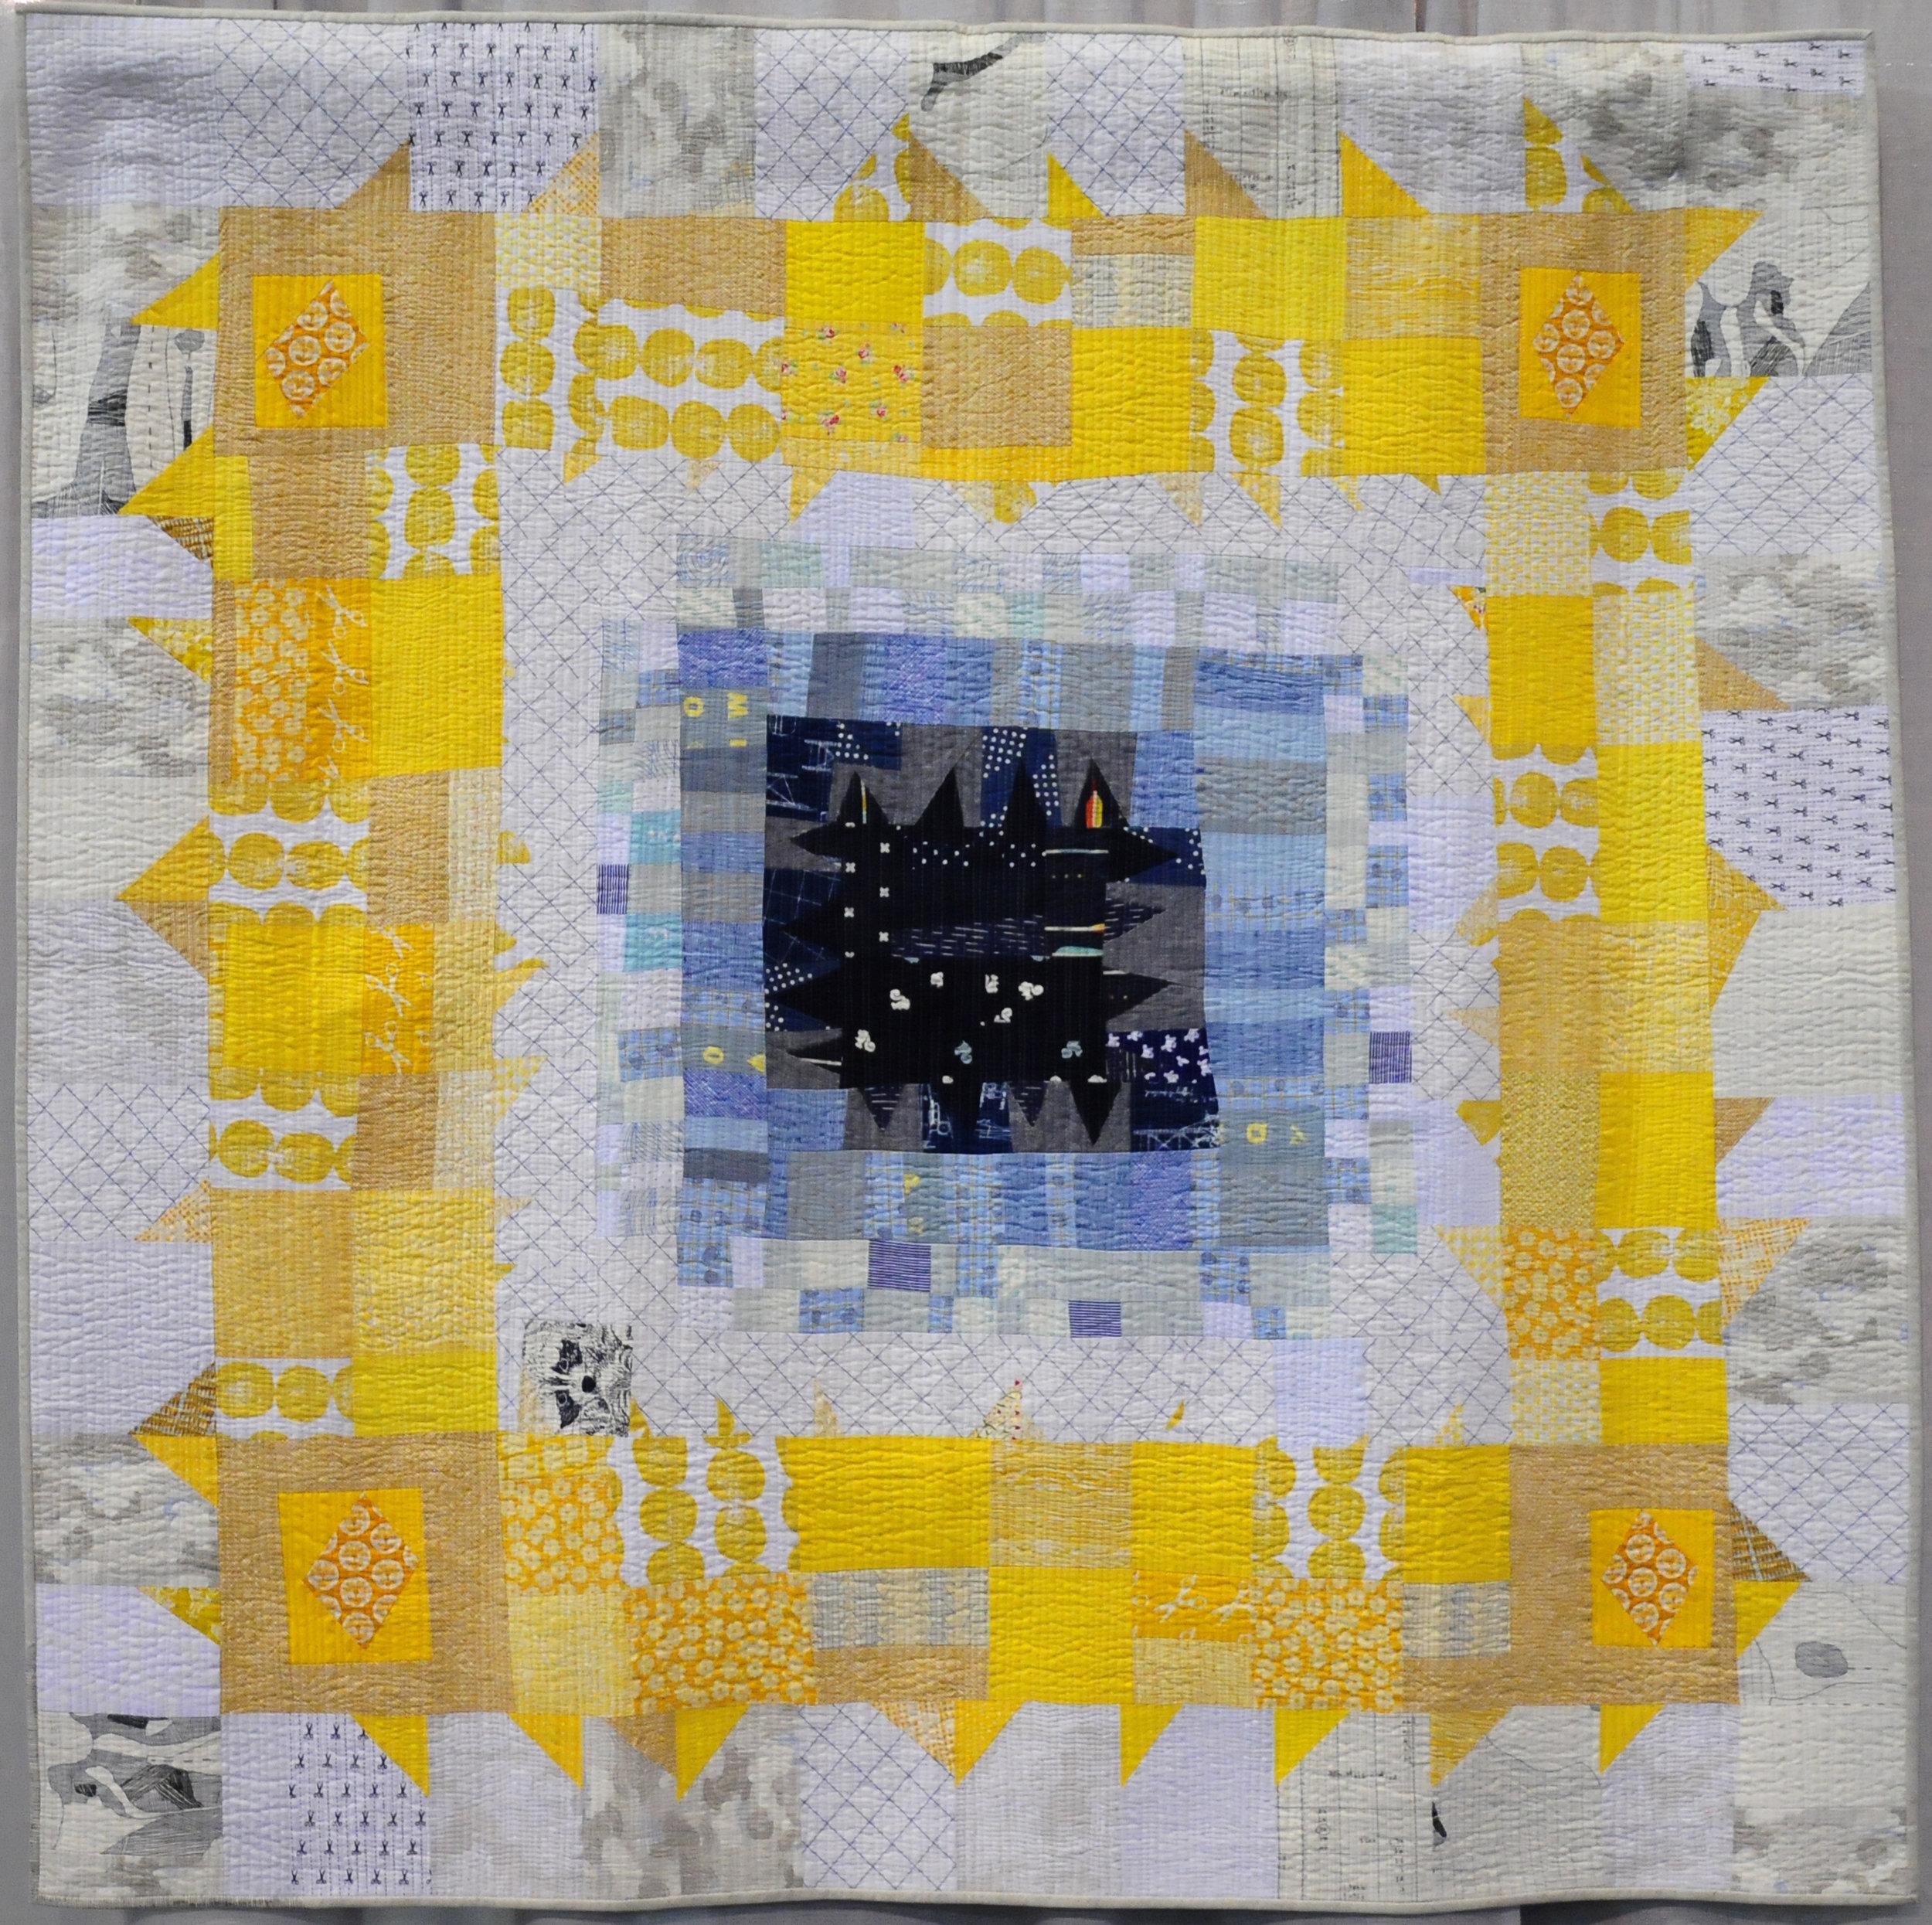 Quilt One Half by Sarah Lowry ( @stitchingandbacon ), detail below